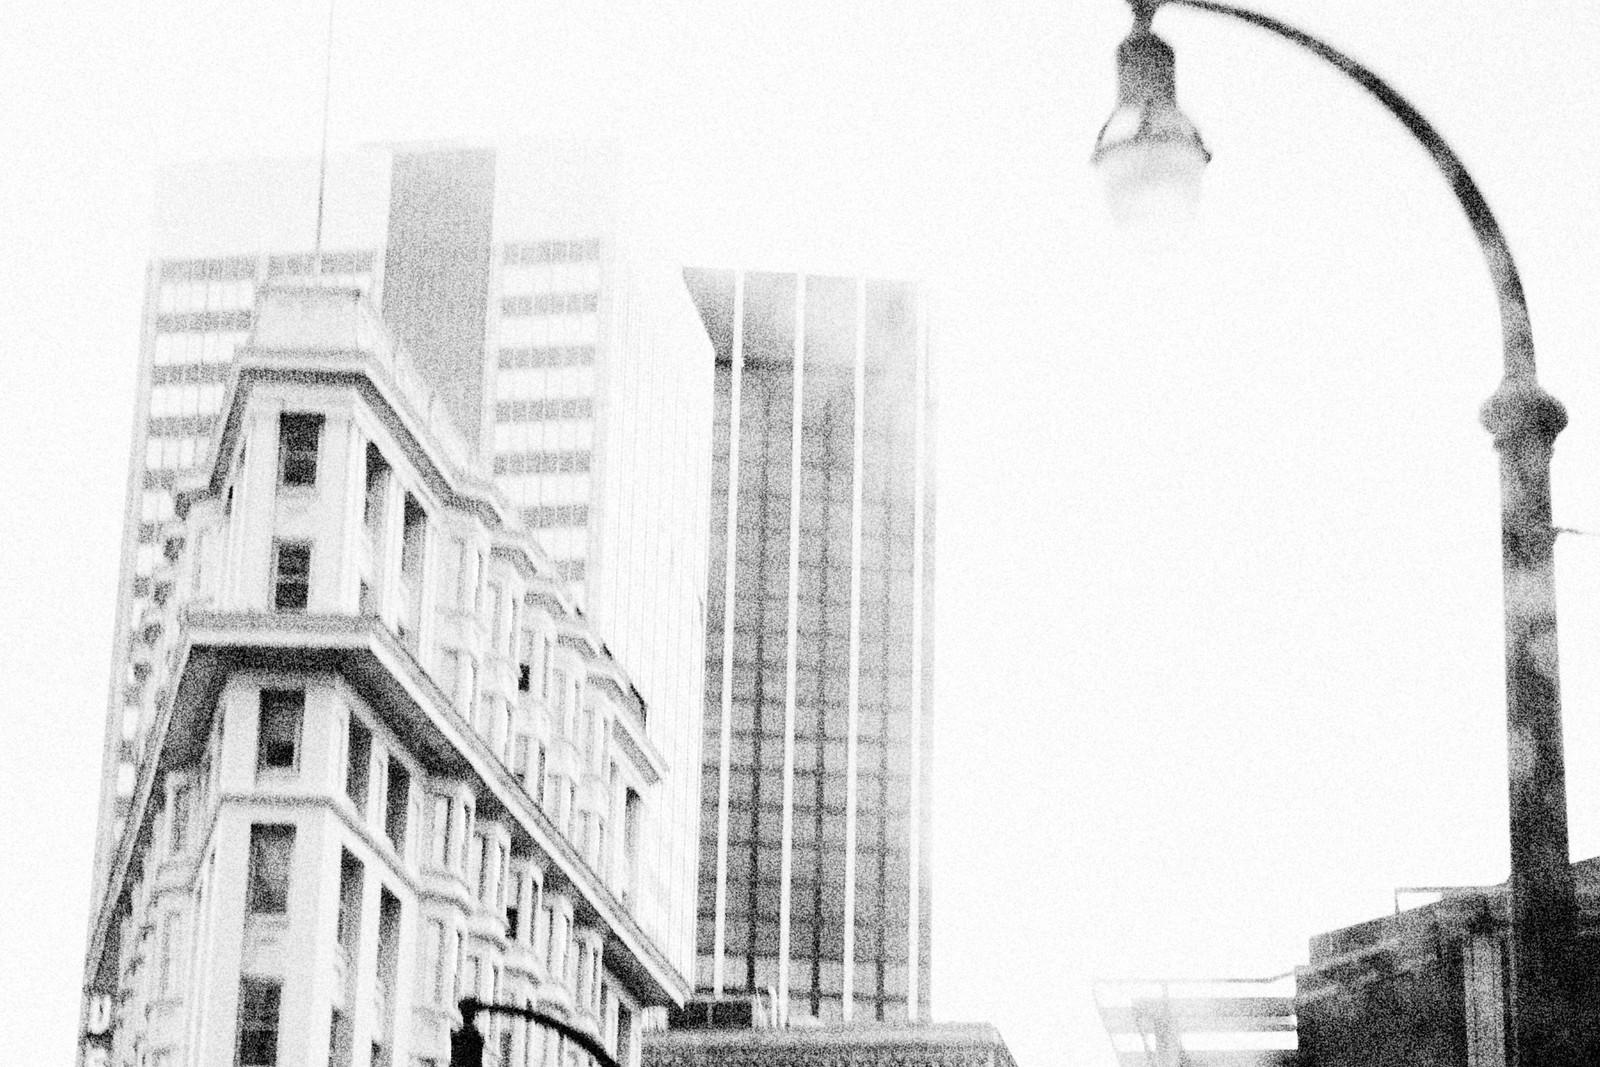 The Flat Iron Building, Downtown Atlanta